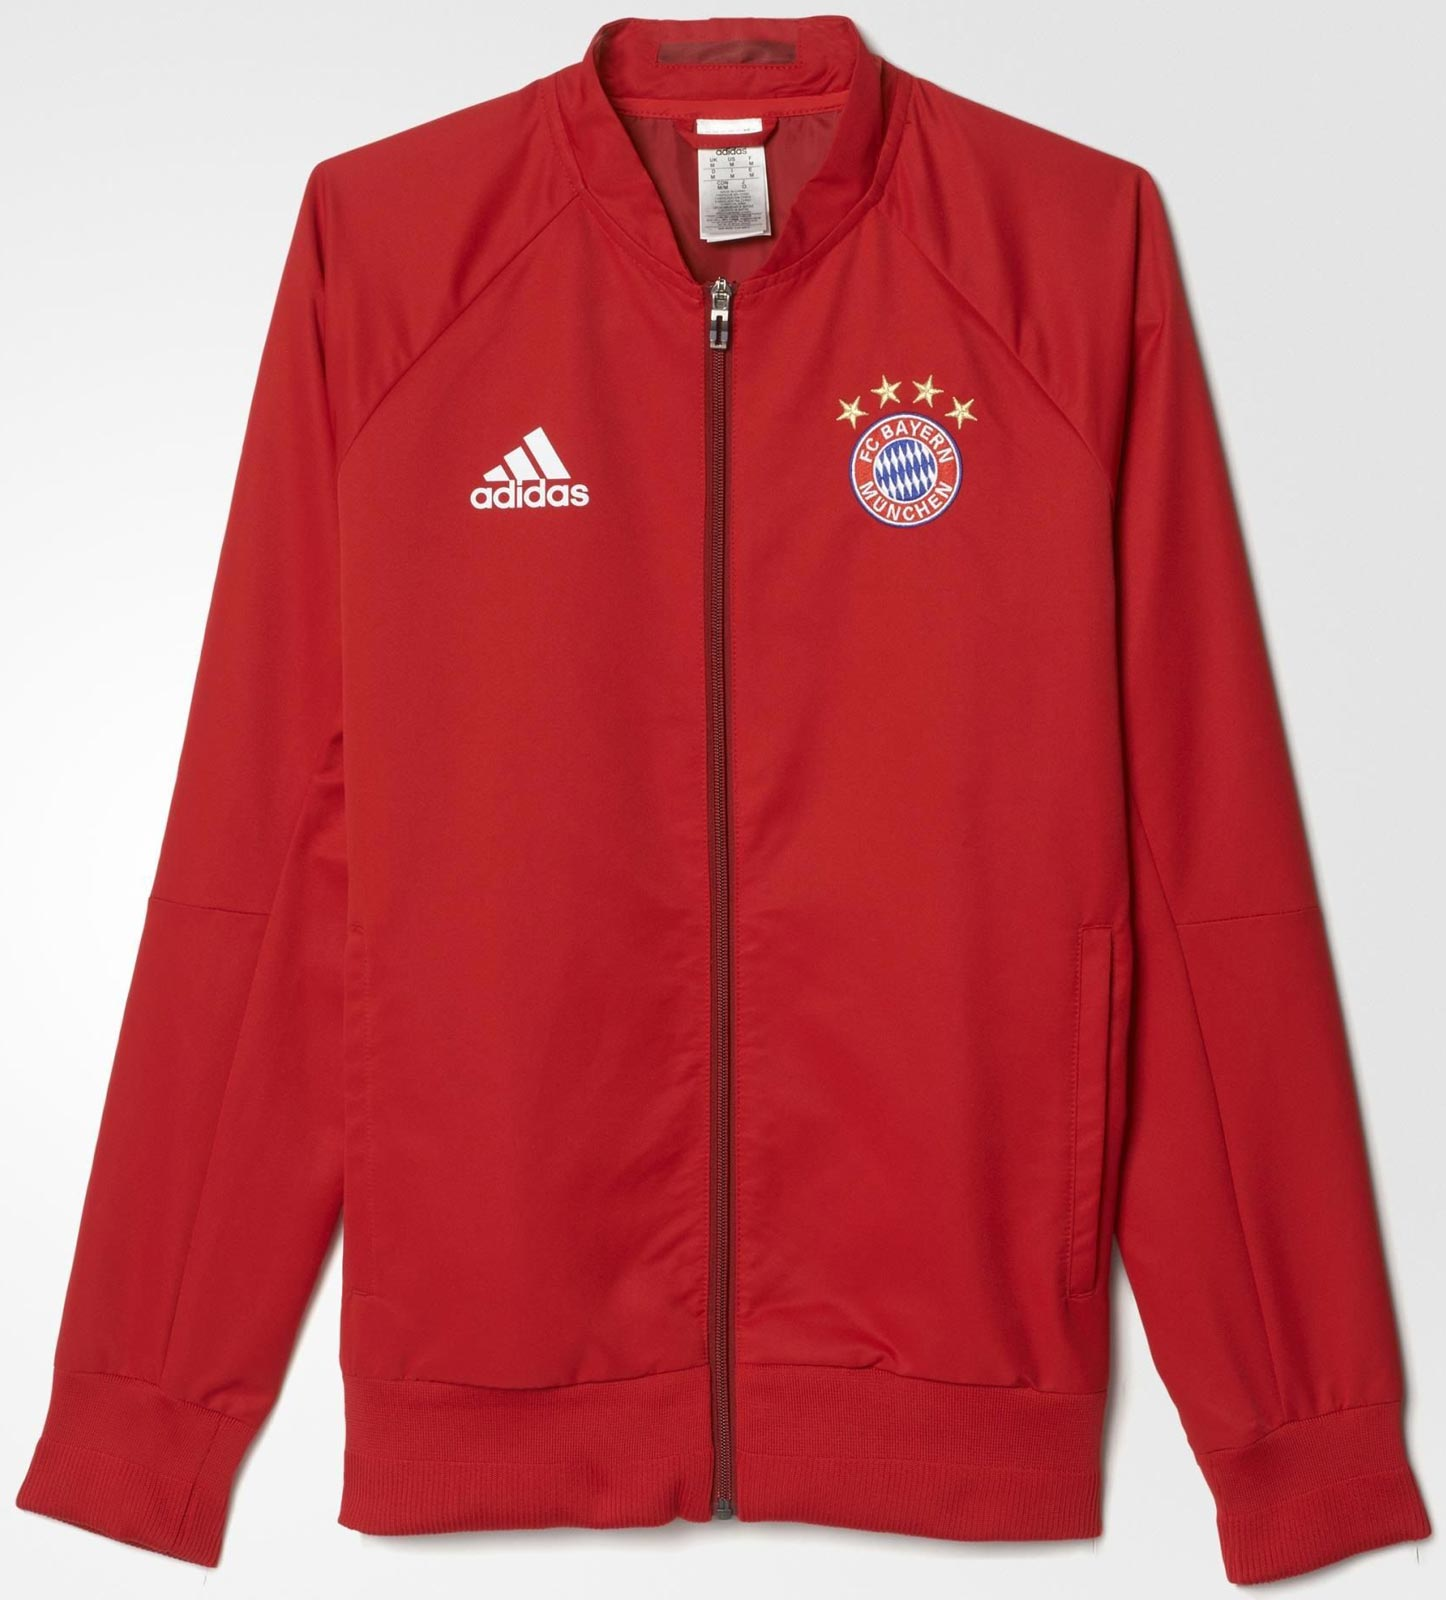 d2949406f5a2 Adidas 2016 Anthem Jackets  Bayern